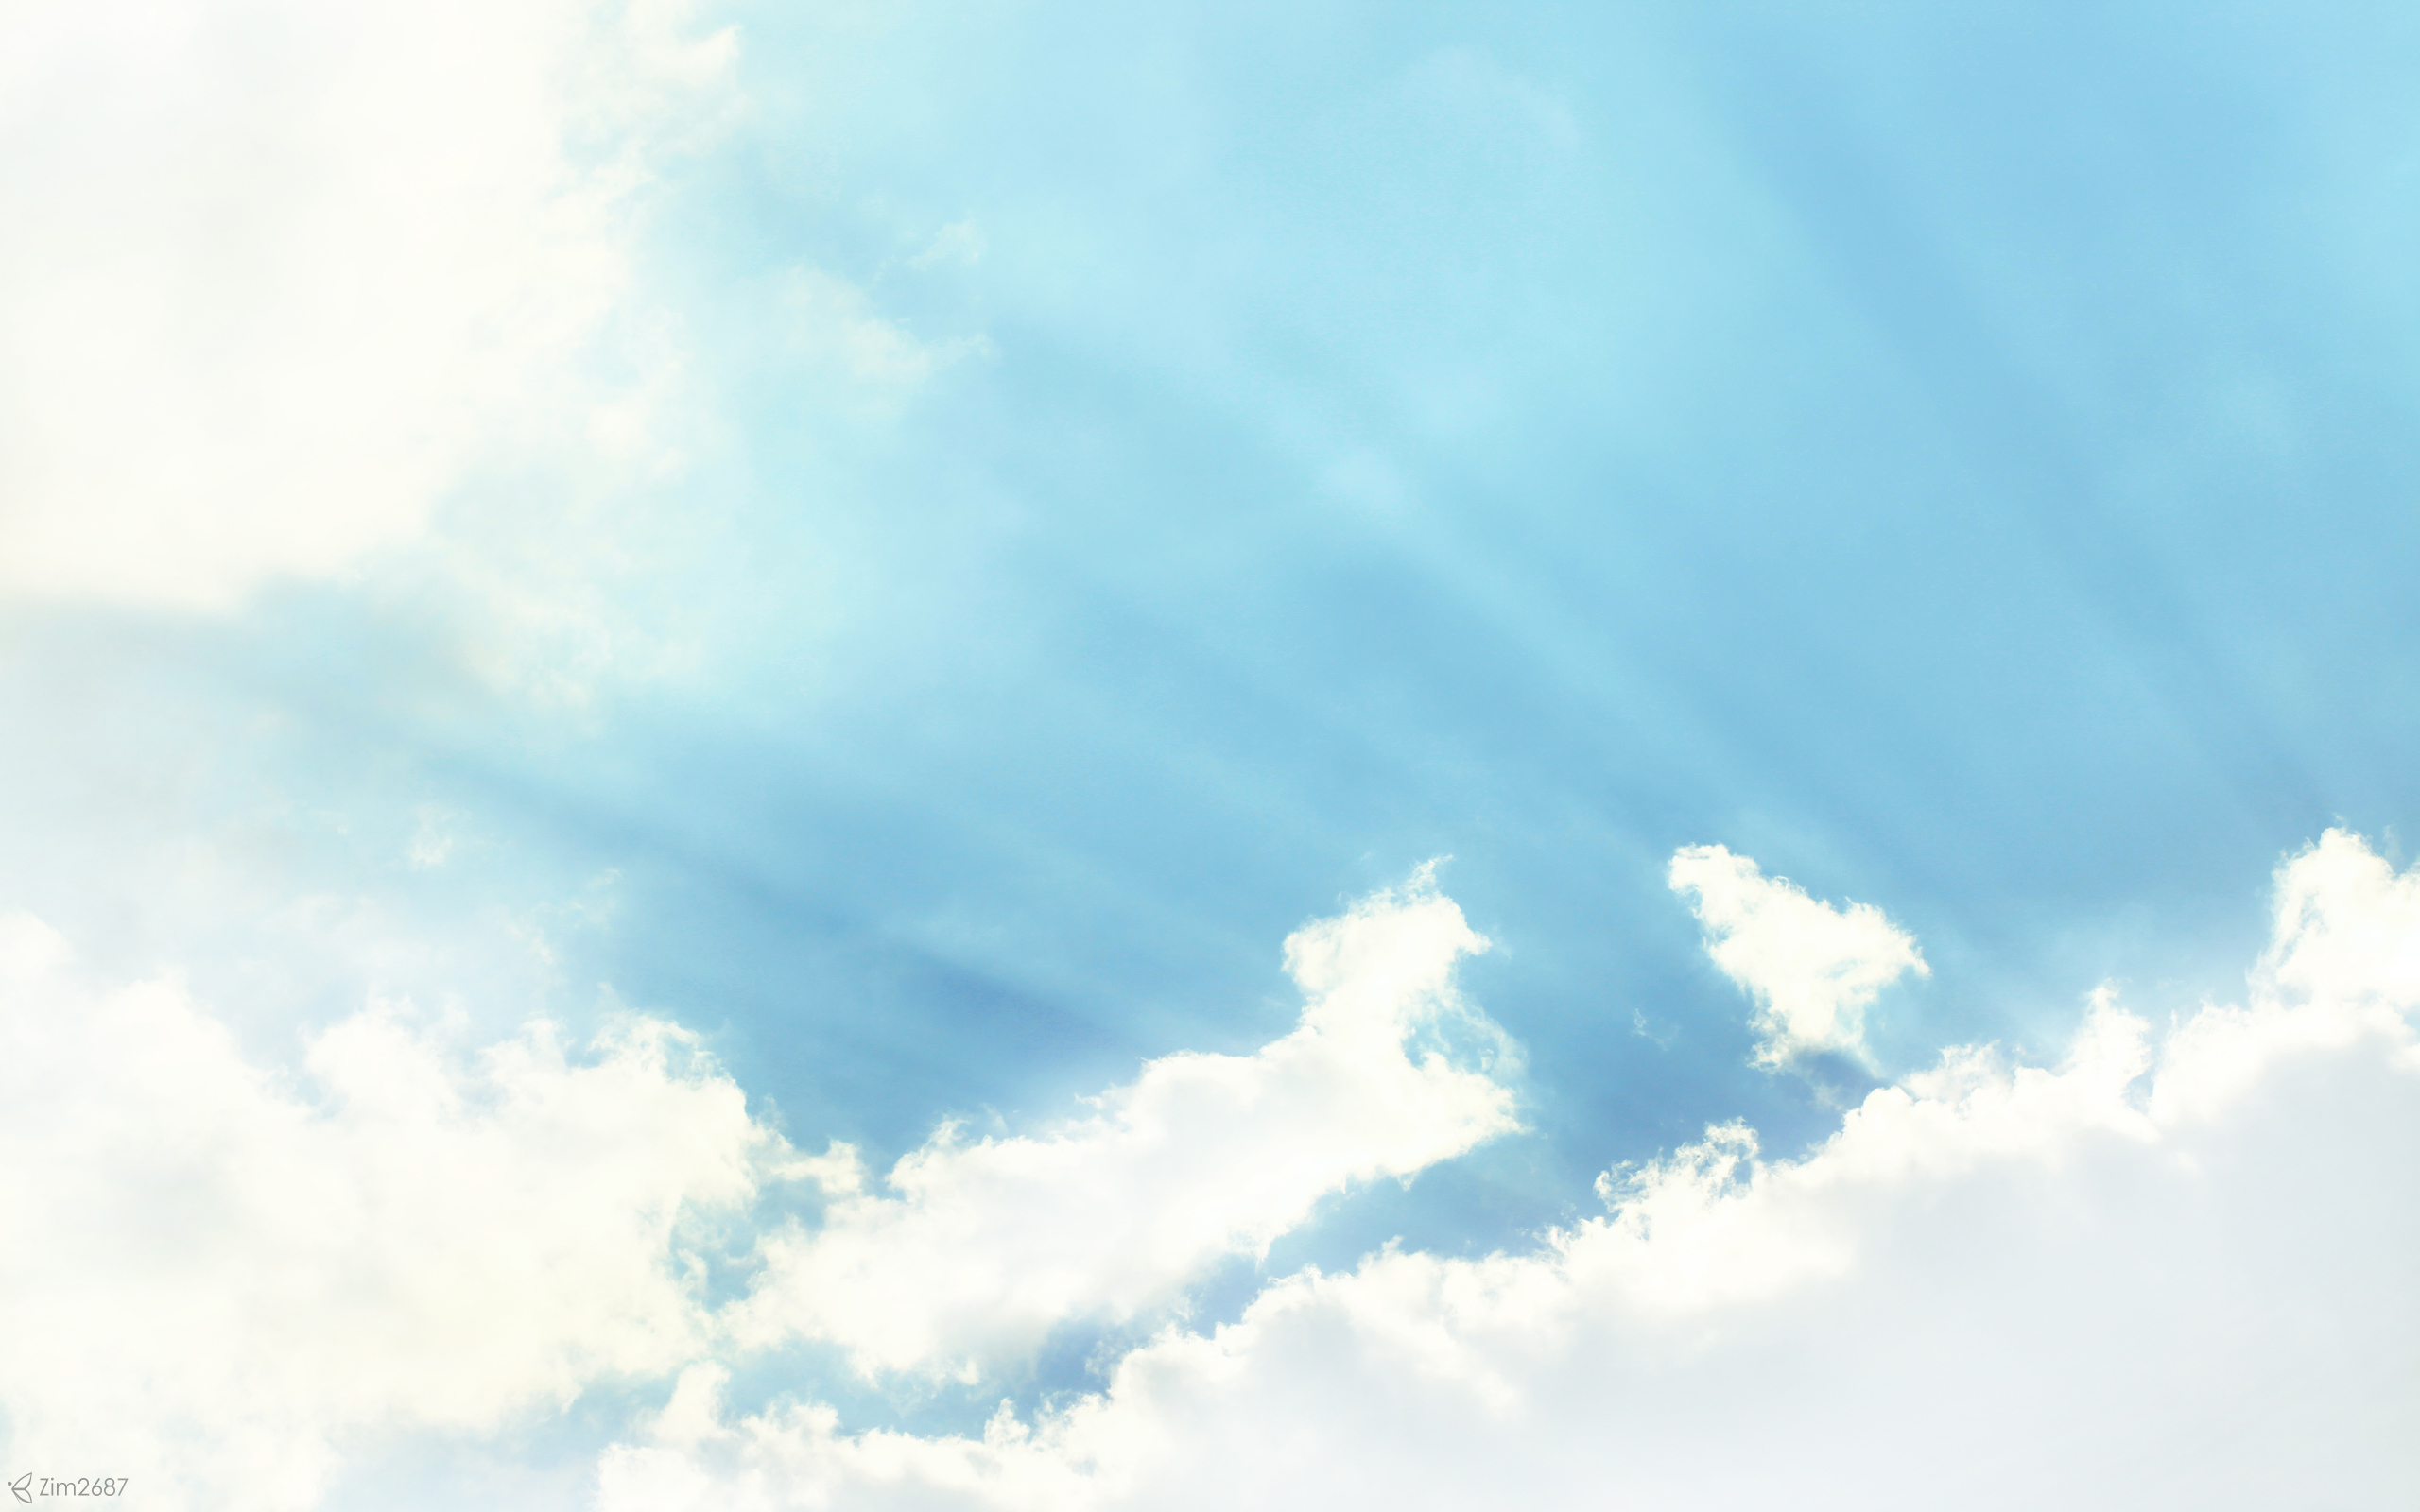 wallpaper name sky sunrays description download sky sunrays categories 2560x1600